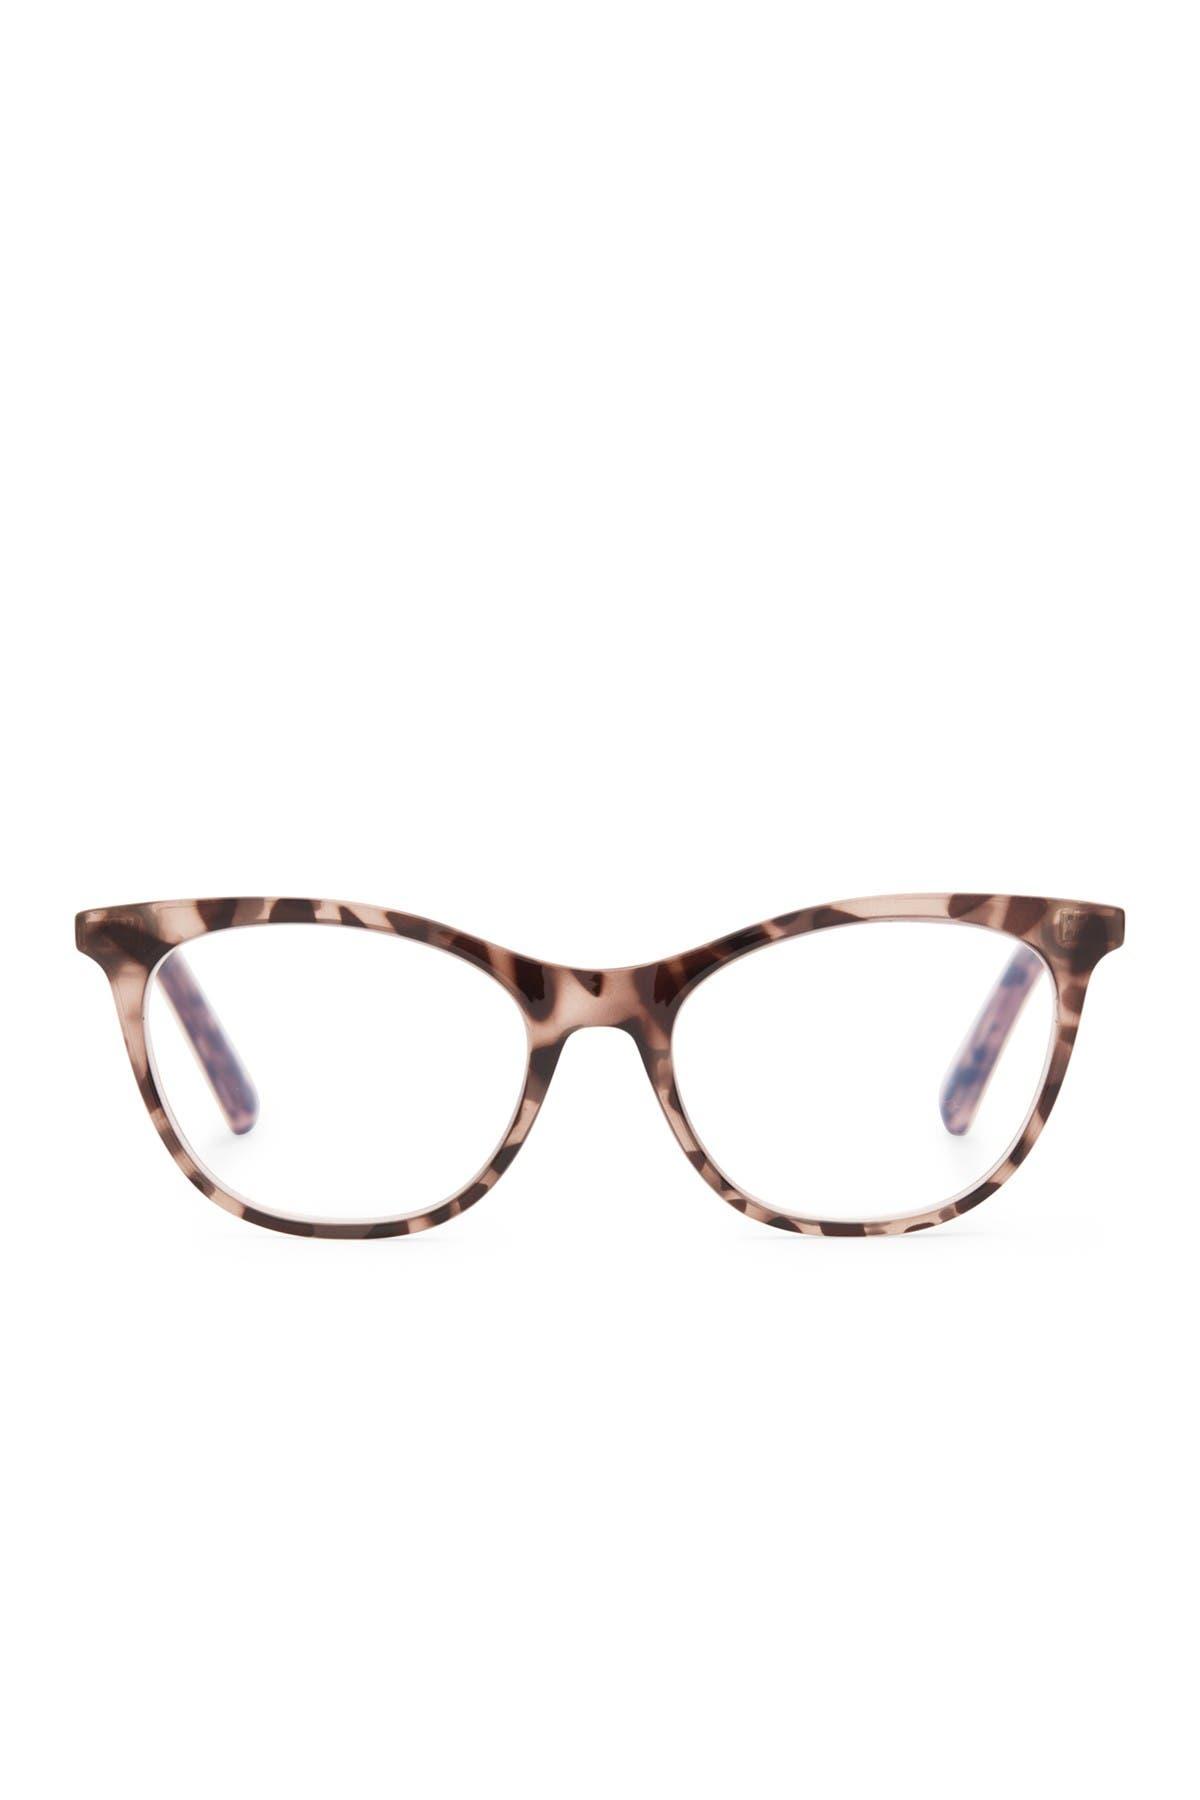 Image of DIFF Eyewear Kady 51mm Optical Frames